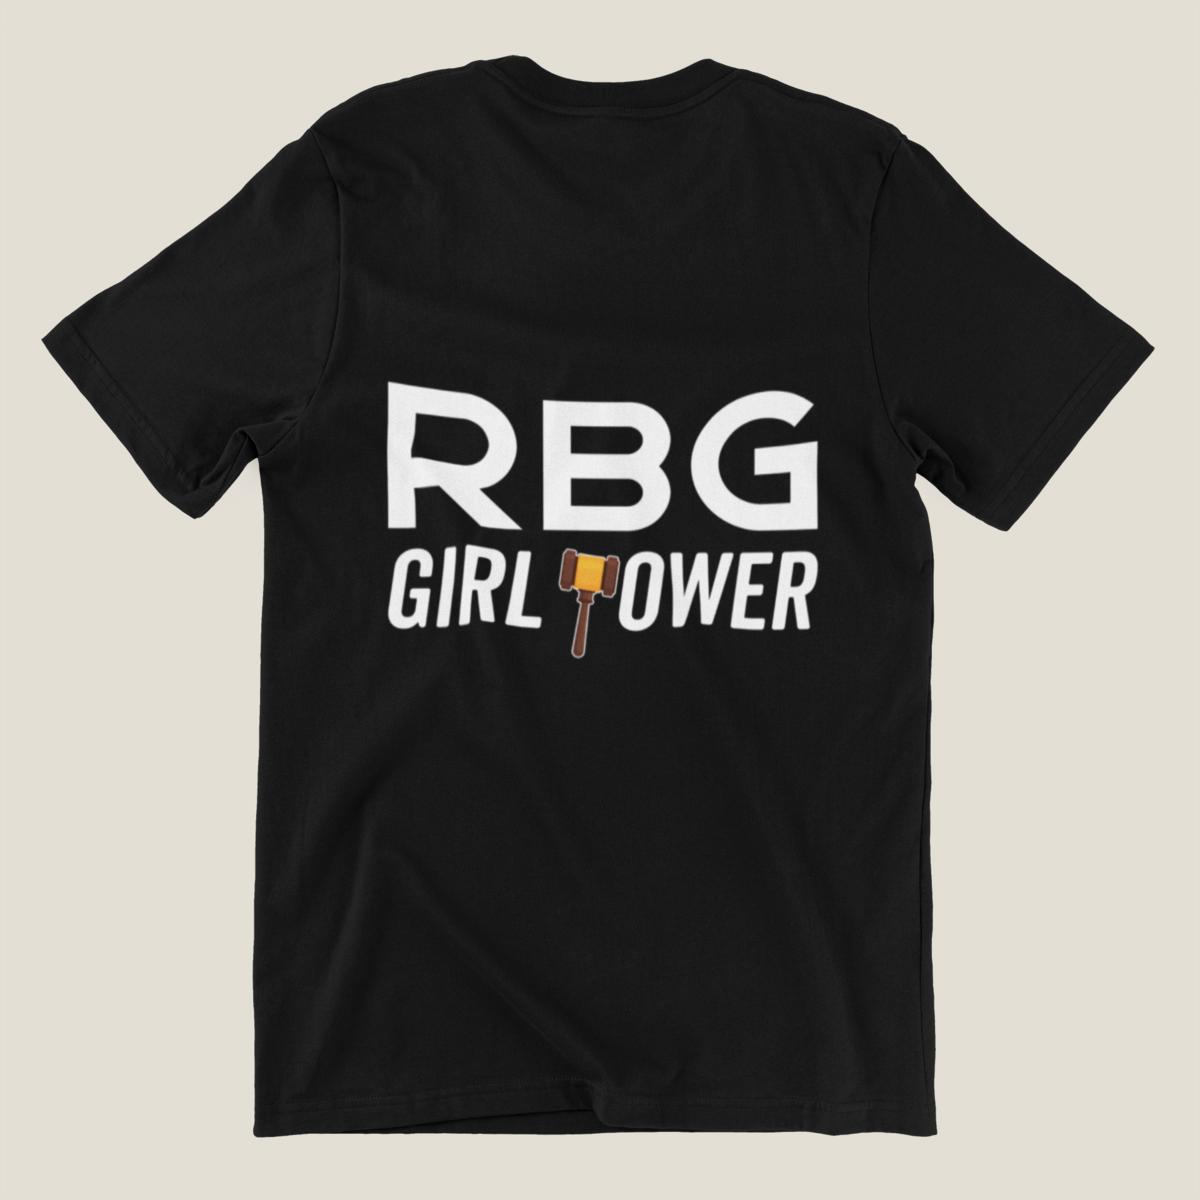 RBG Ruth Bader Ginsburg Girl Power Feminist Feminism Woman T-Shirt, Woman's Large, Black